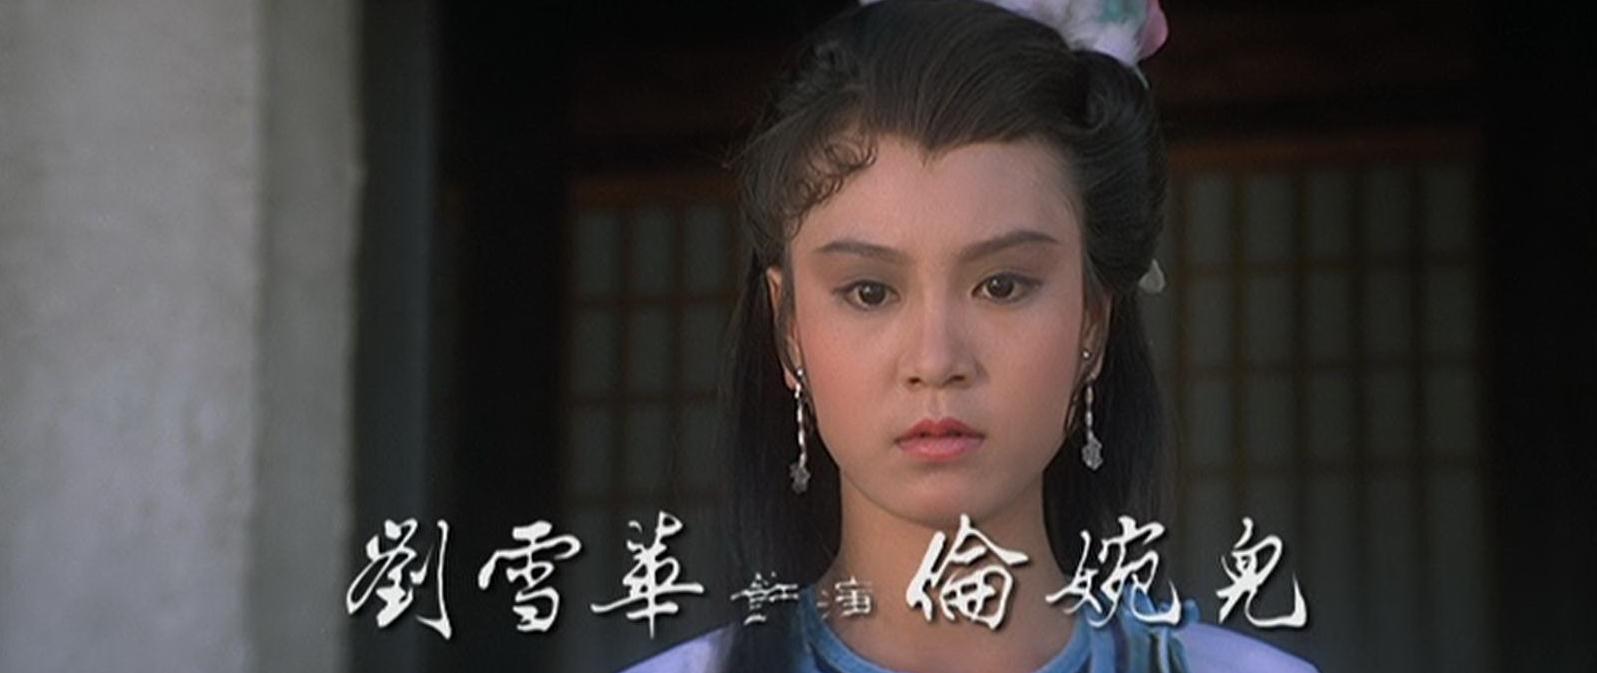 Liu Hsueh-hua